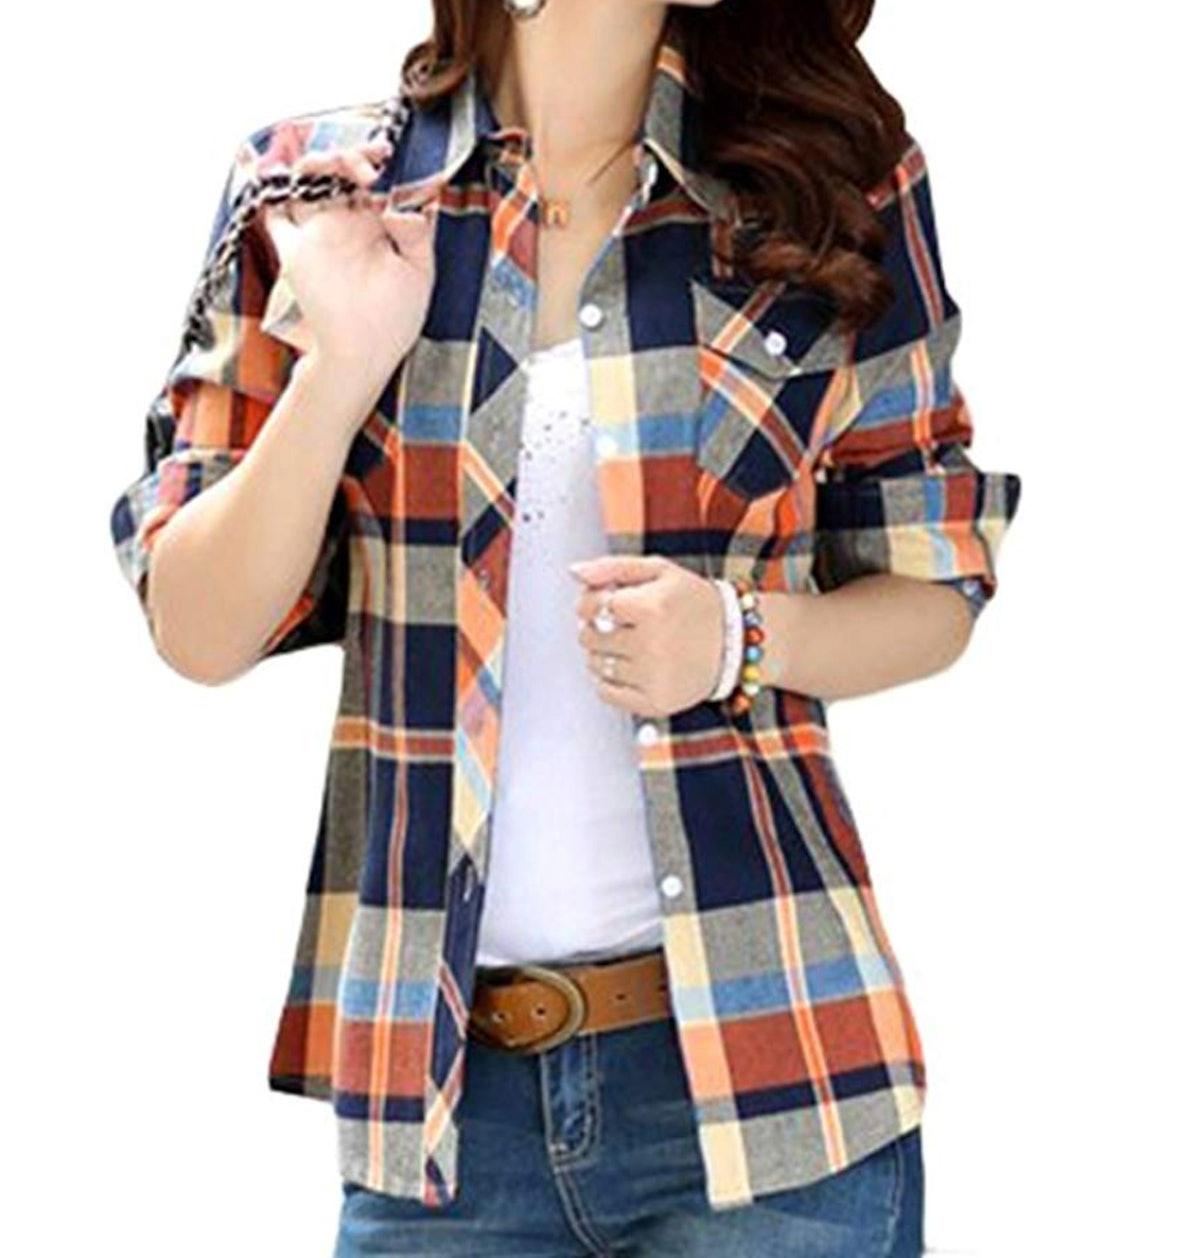 Lasher Female Cotton Casual Plaid Button-up Shirt